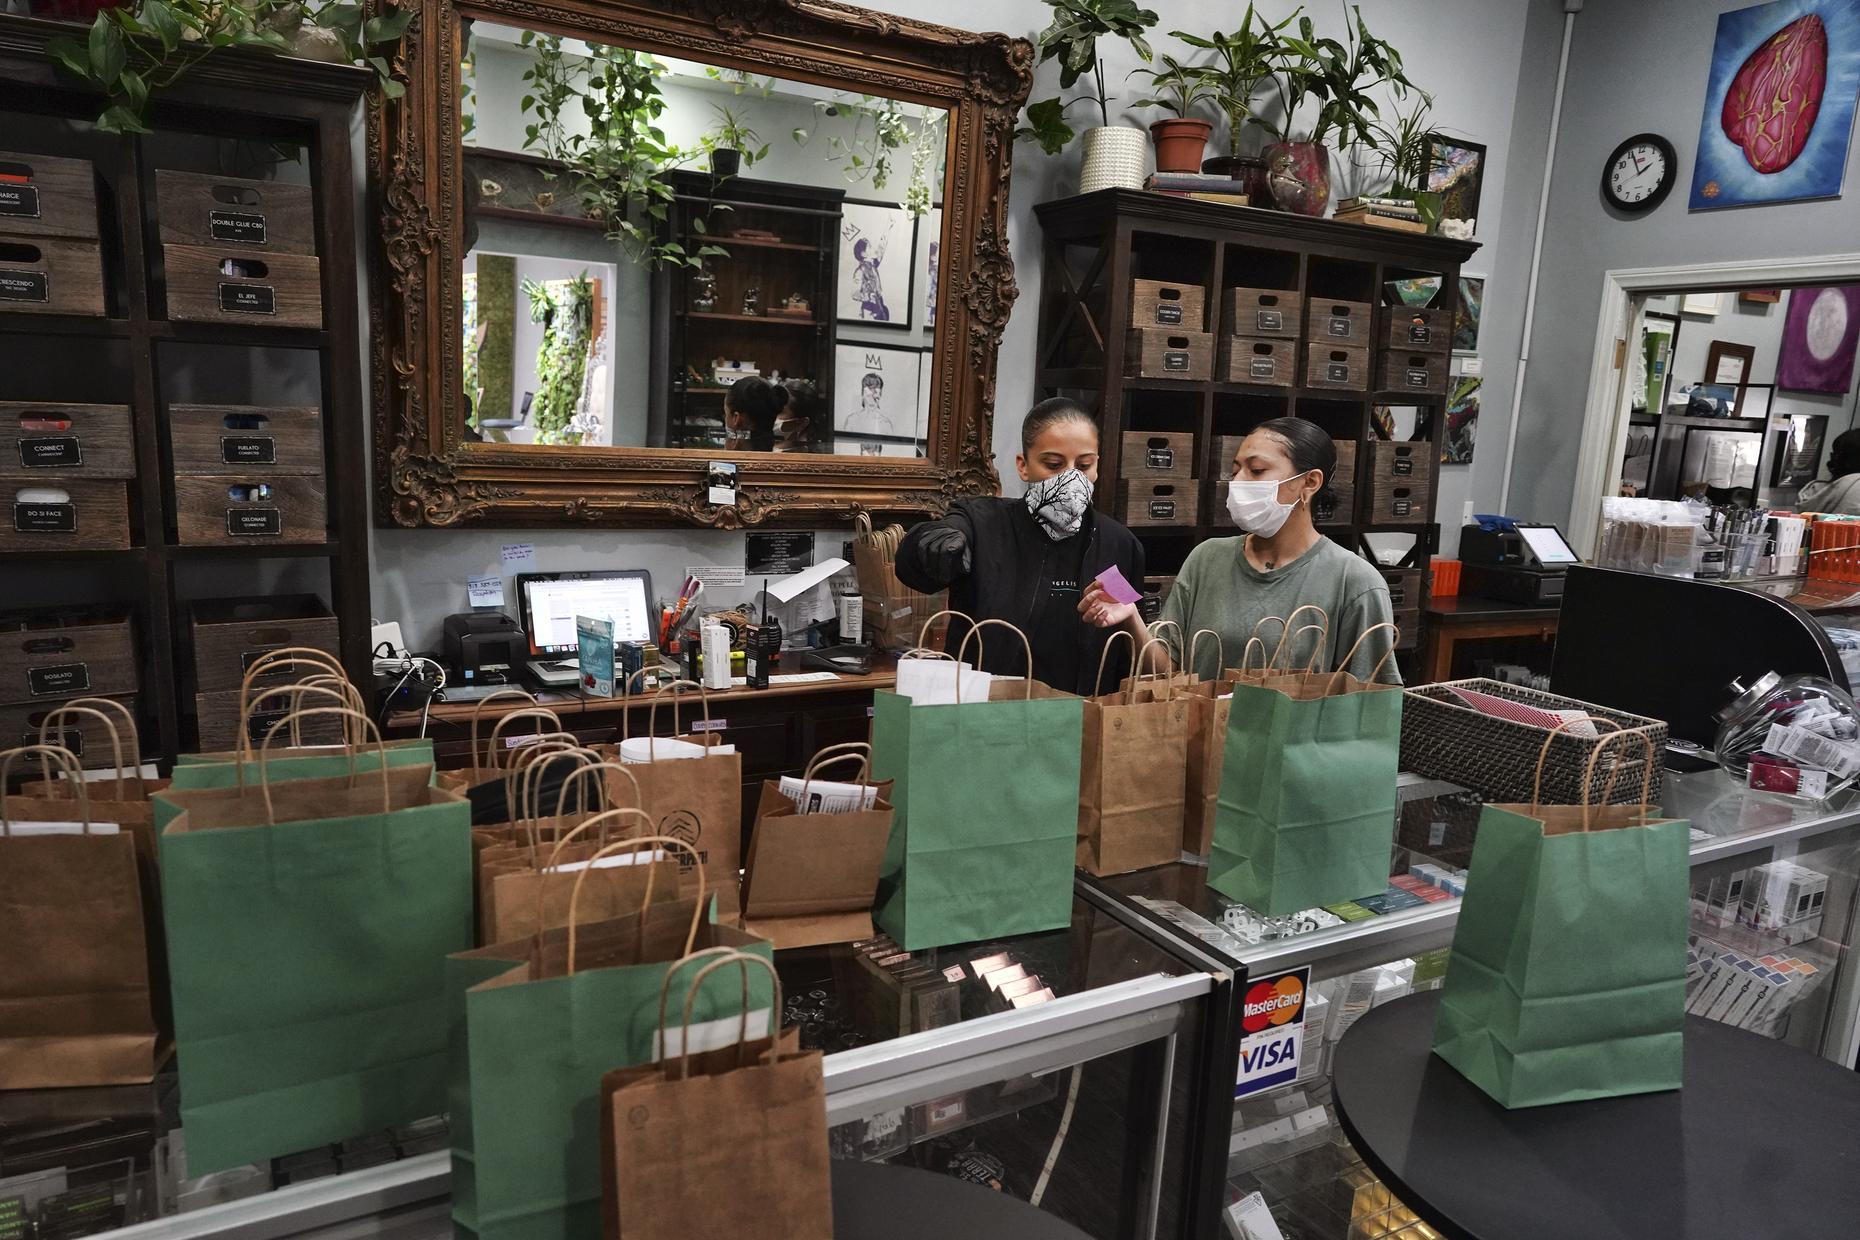 New York legalizes America's most progressive recreational weed market